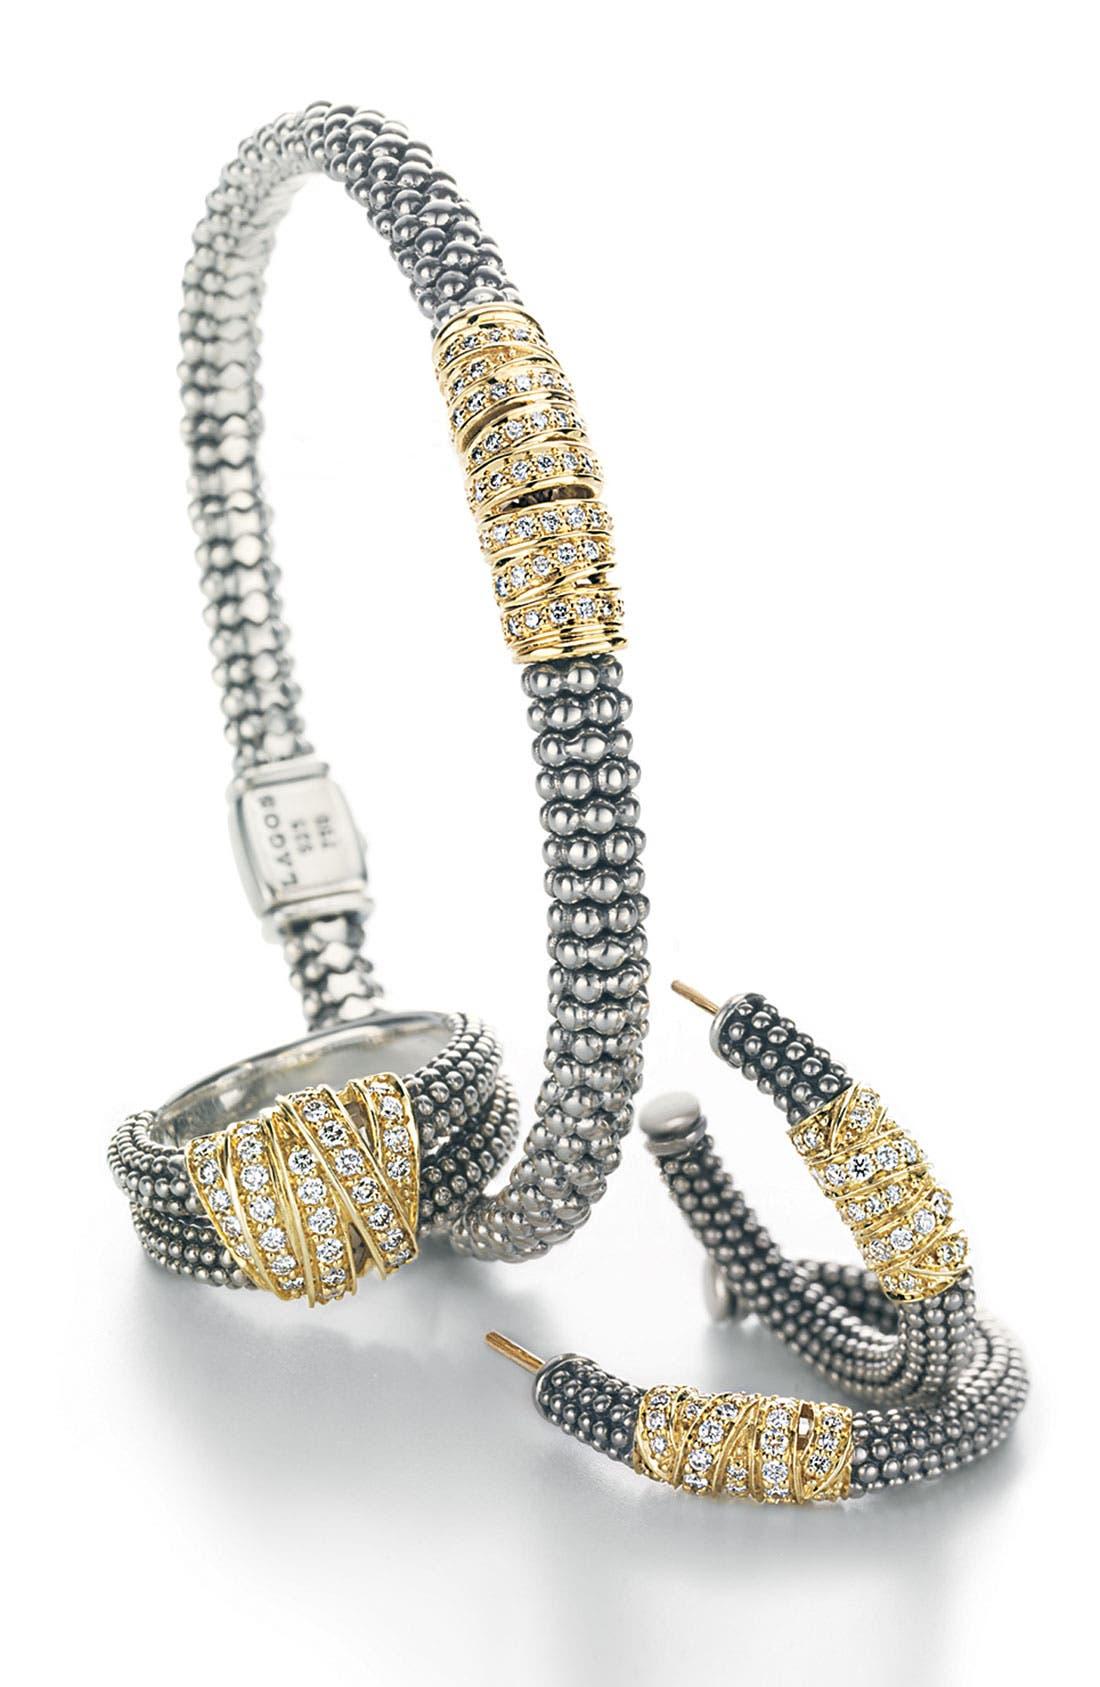 'Embrace' Caviar Diamond Hoop Earrings,                             Alternate thumbnail 5, color,                             STERLING SILVER/ GOLD